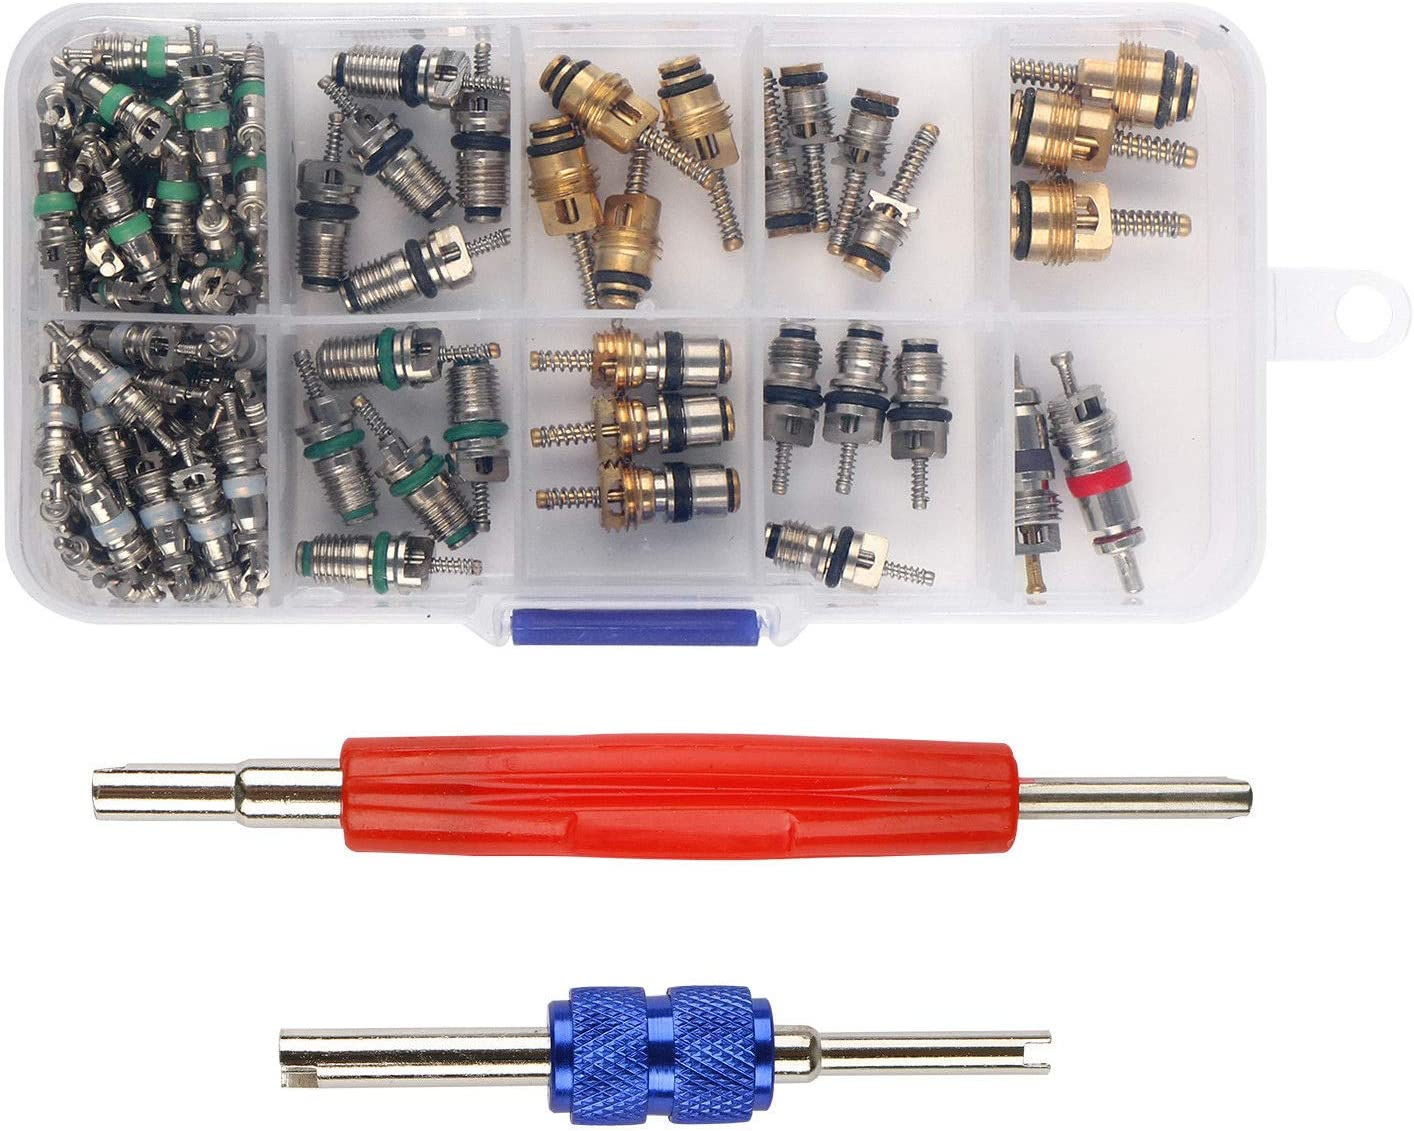 Car Air Conditioning Core Valves 102Pcs,R12 R134A Automotive A//C Valve Stem Cores w//Removal Tool for Car Air Contitionaing Repair